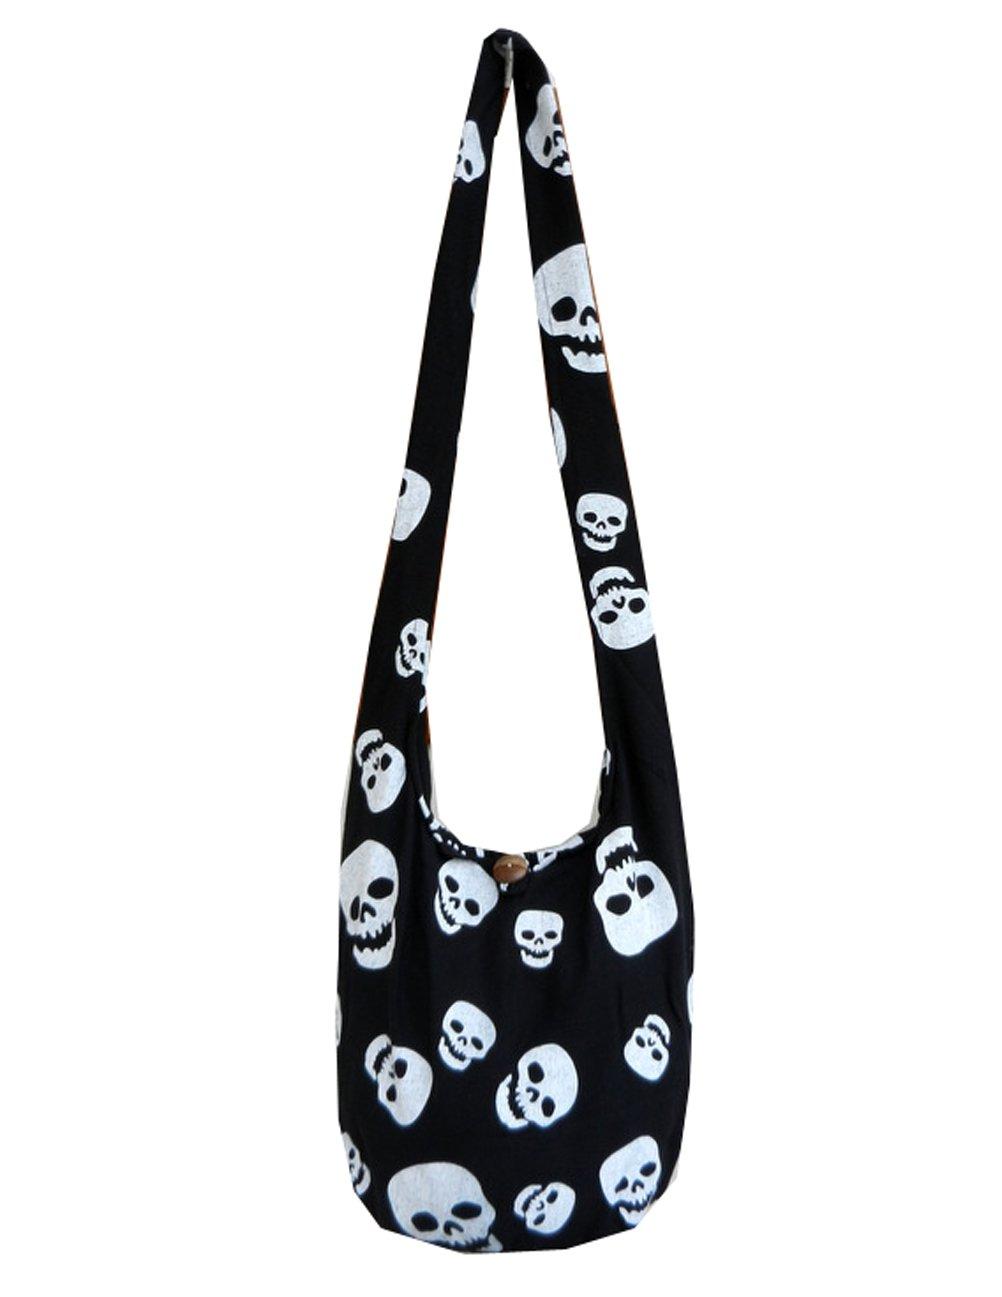 BTP! Skull Punk Rock Hippie Hobo Thai Cotton Sling Crossbody Bag Messenger Purse Small (Black SKS5) by BenThai Products